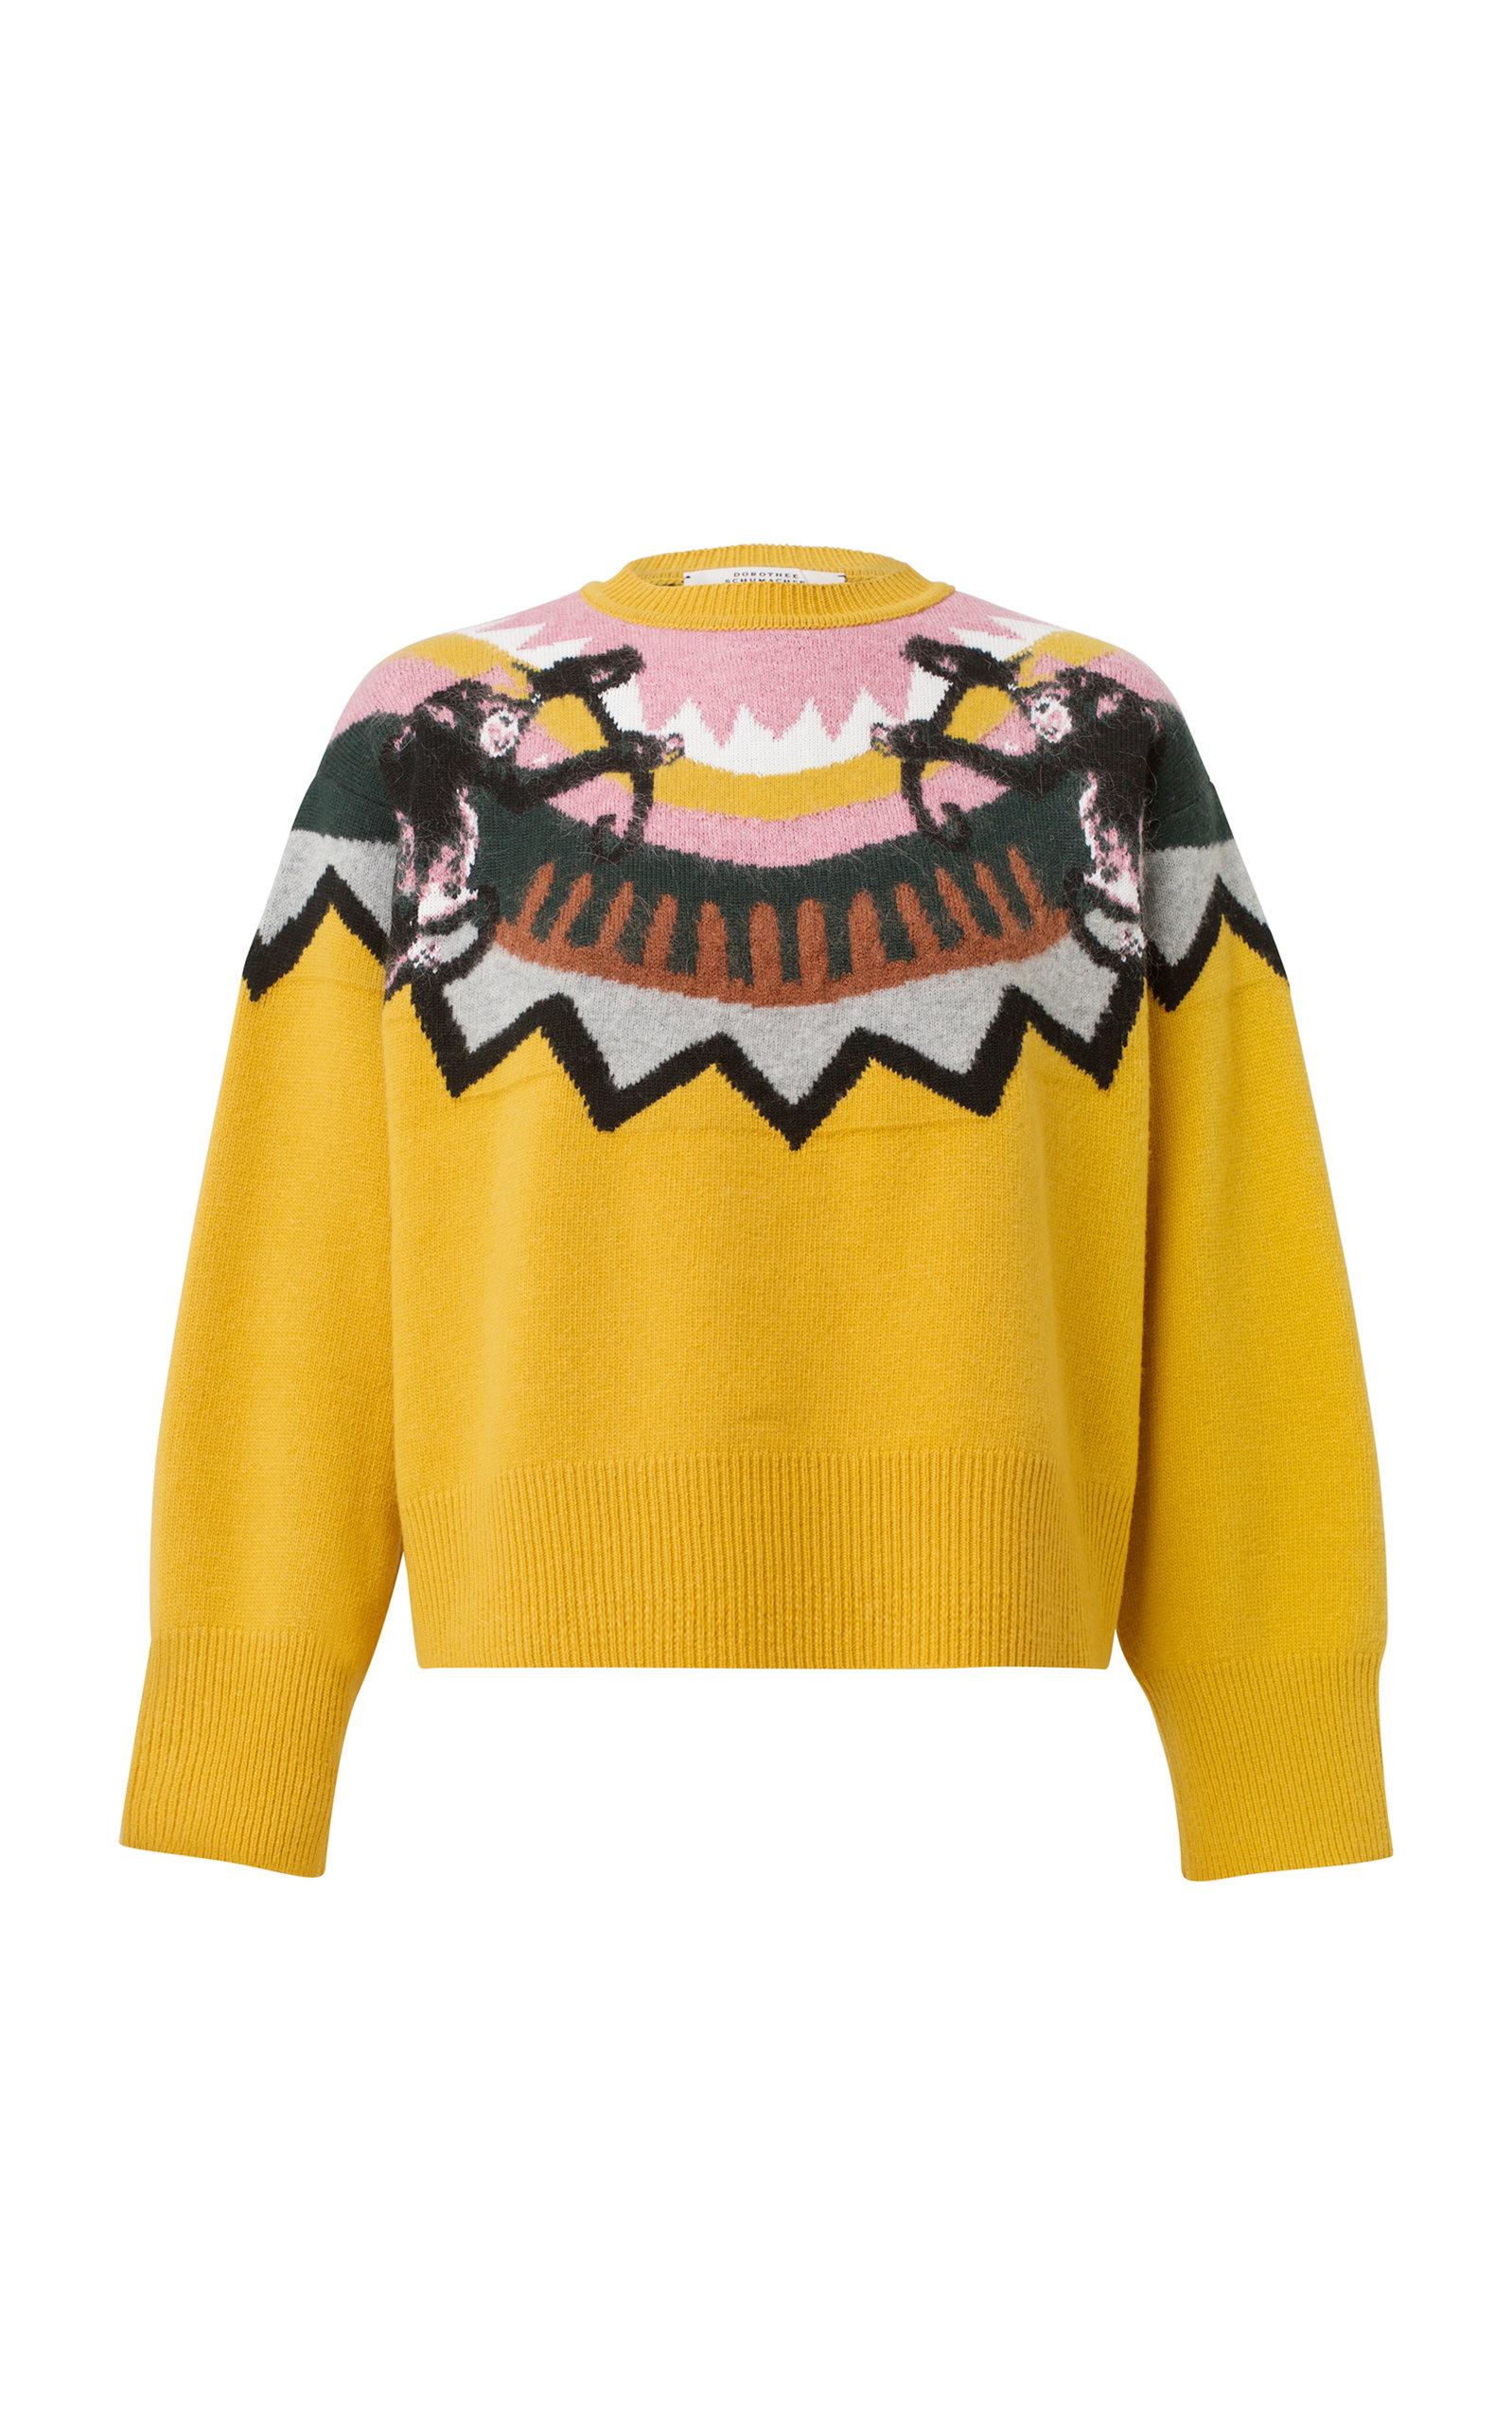 DOROTHEE SCHUMACHER Multicolor Warm Honey Wild Wonder Pullover in Yellow